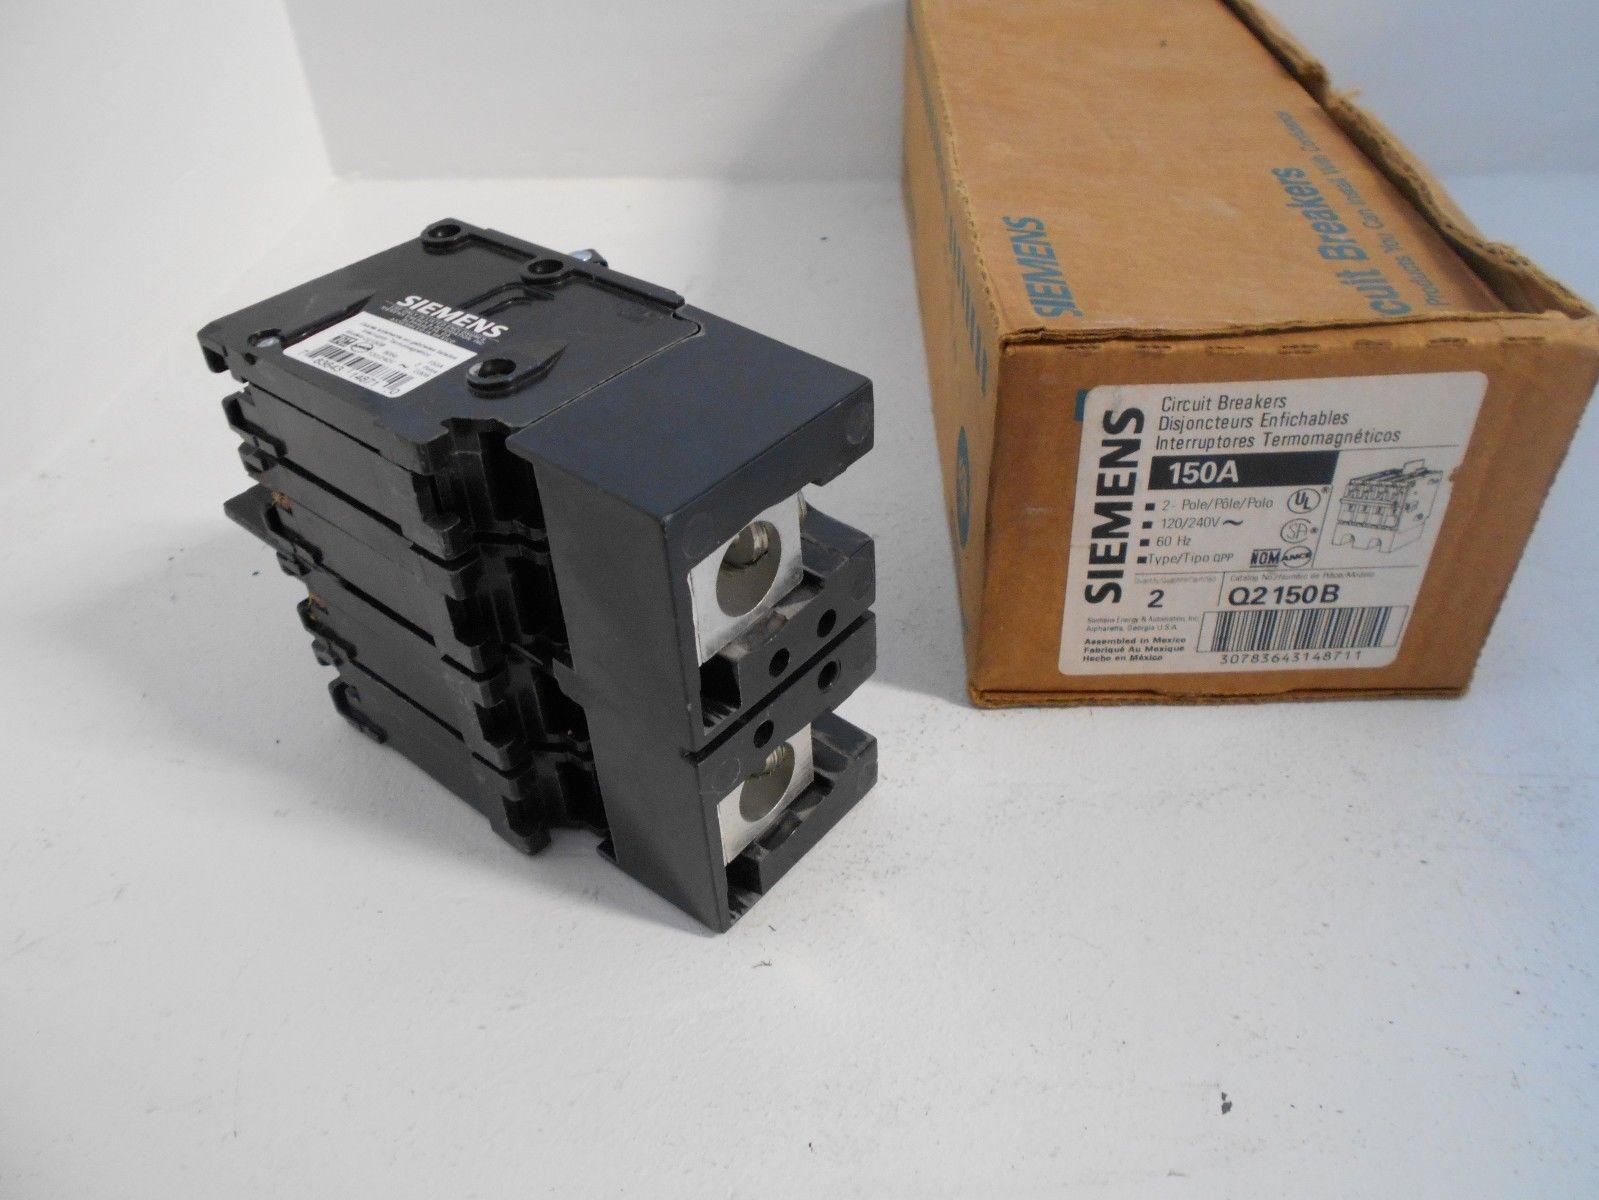 New In Box Siemens Ite Q2150b 150 Amp 2 Pole 240 V Main Breaker Plug Fuse